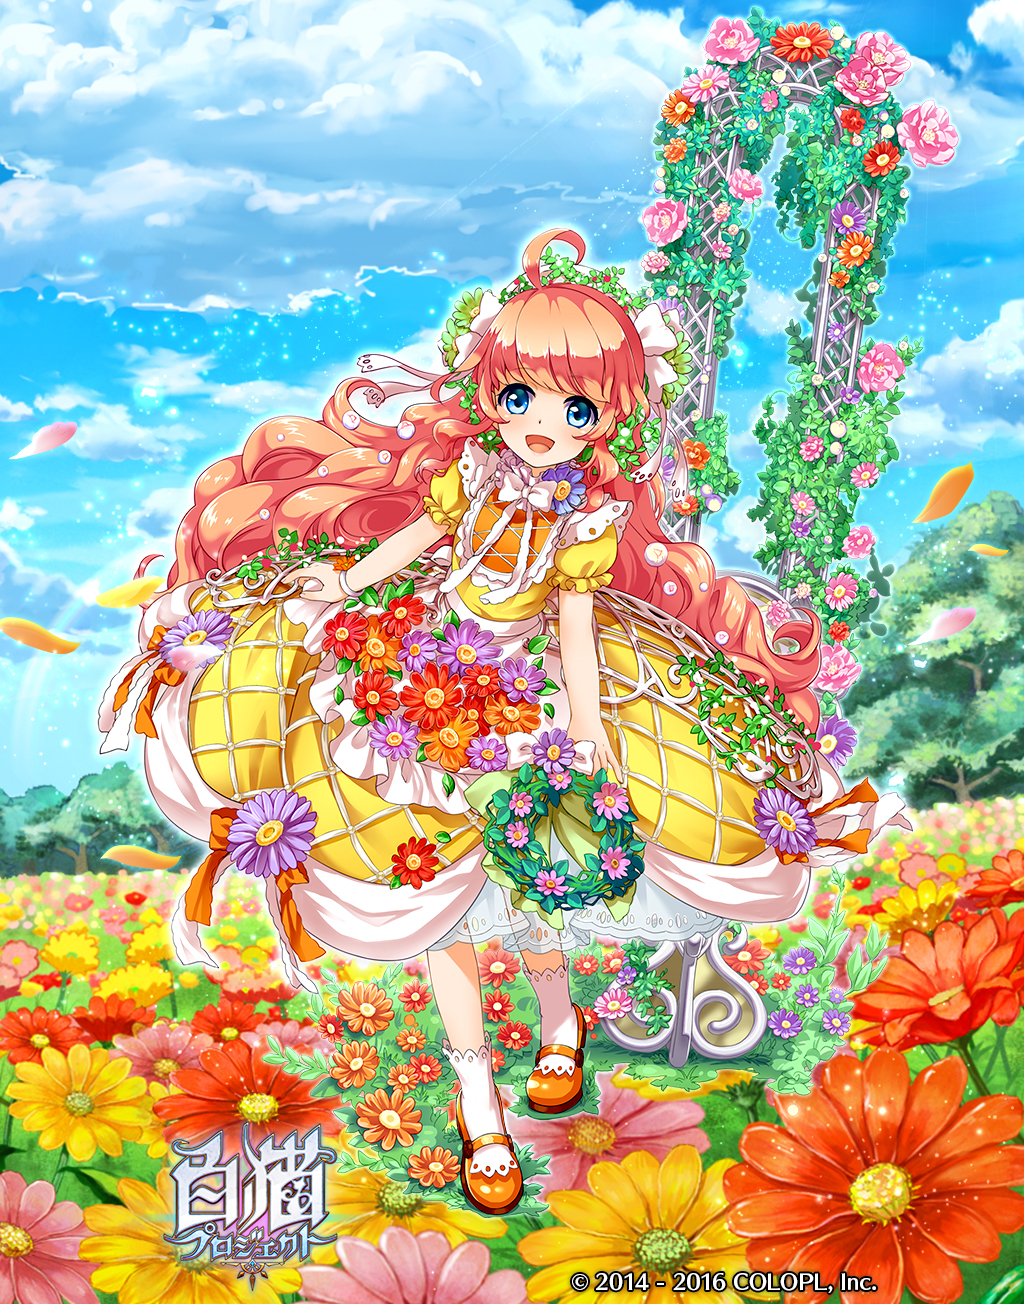 Flower Of Grace 壁紙セット 白猫プロジェクト 公式サイト 株式